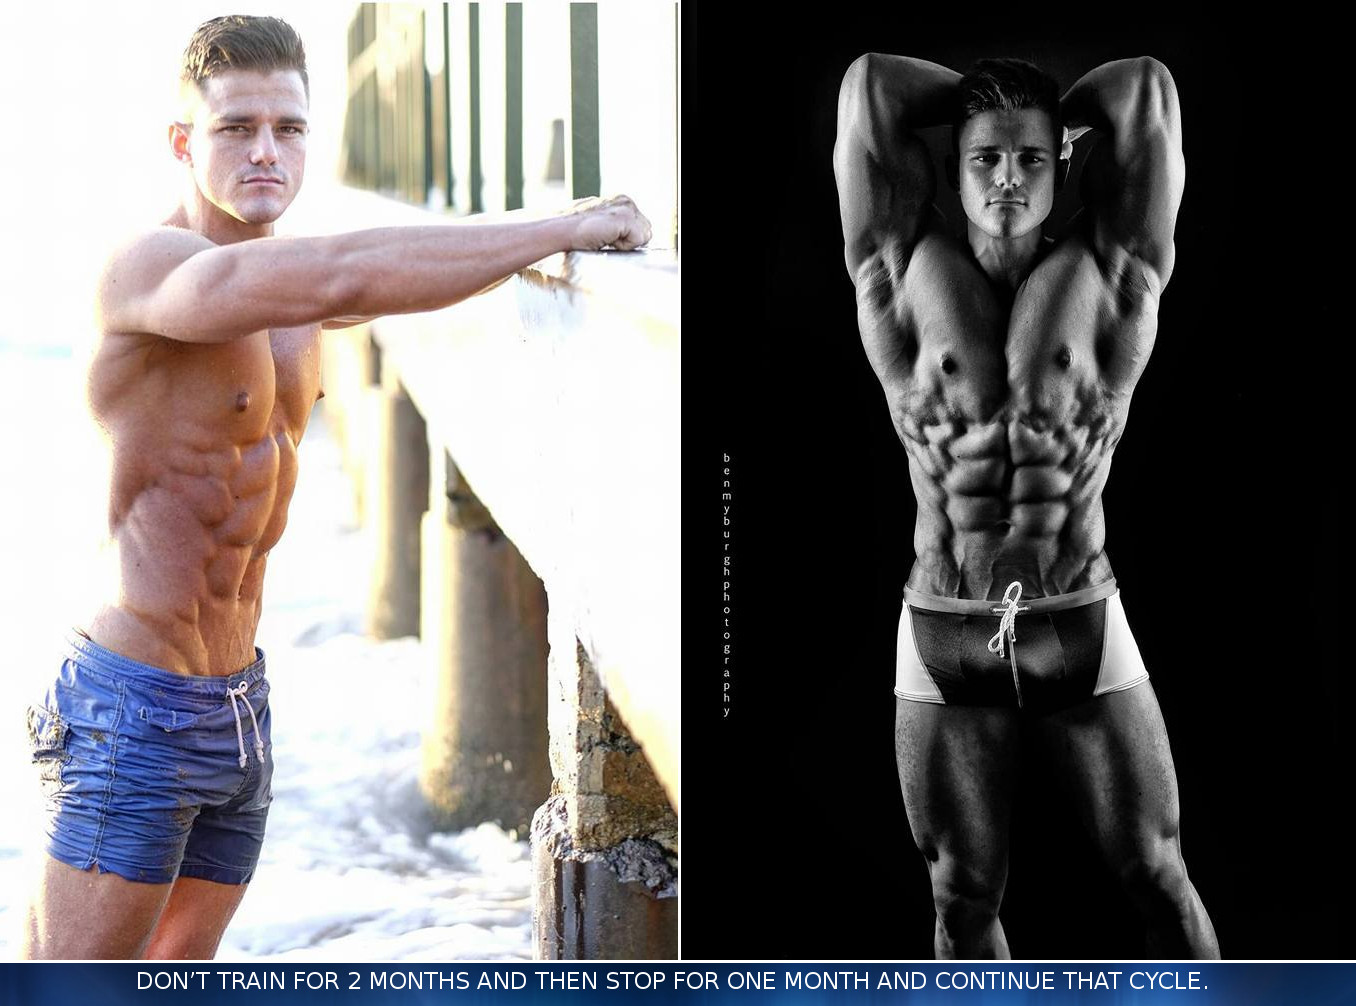 Fitnish.com interview With Aesthetix Era Sponsored Fitness Model, David Watkeys